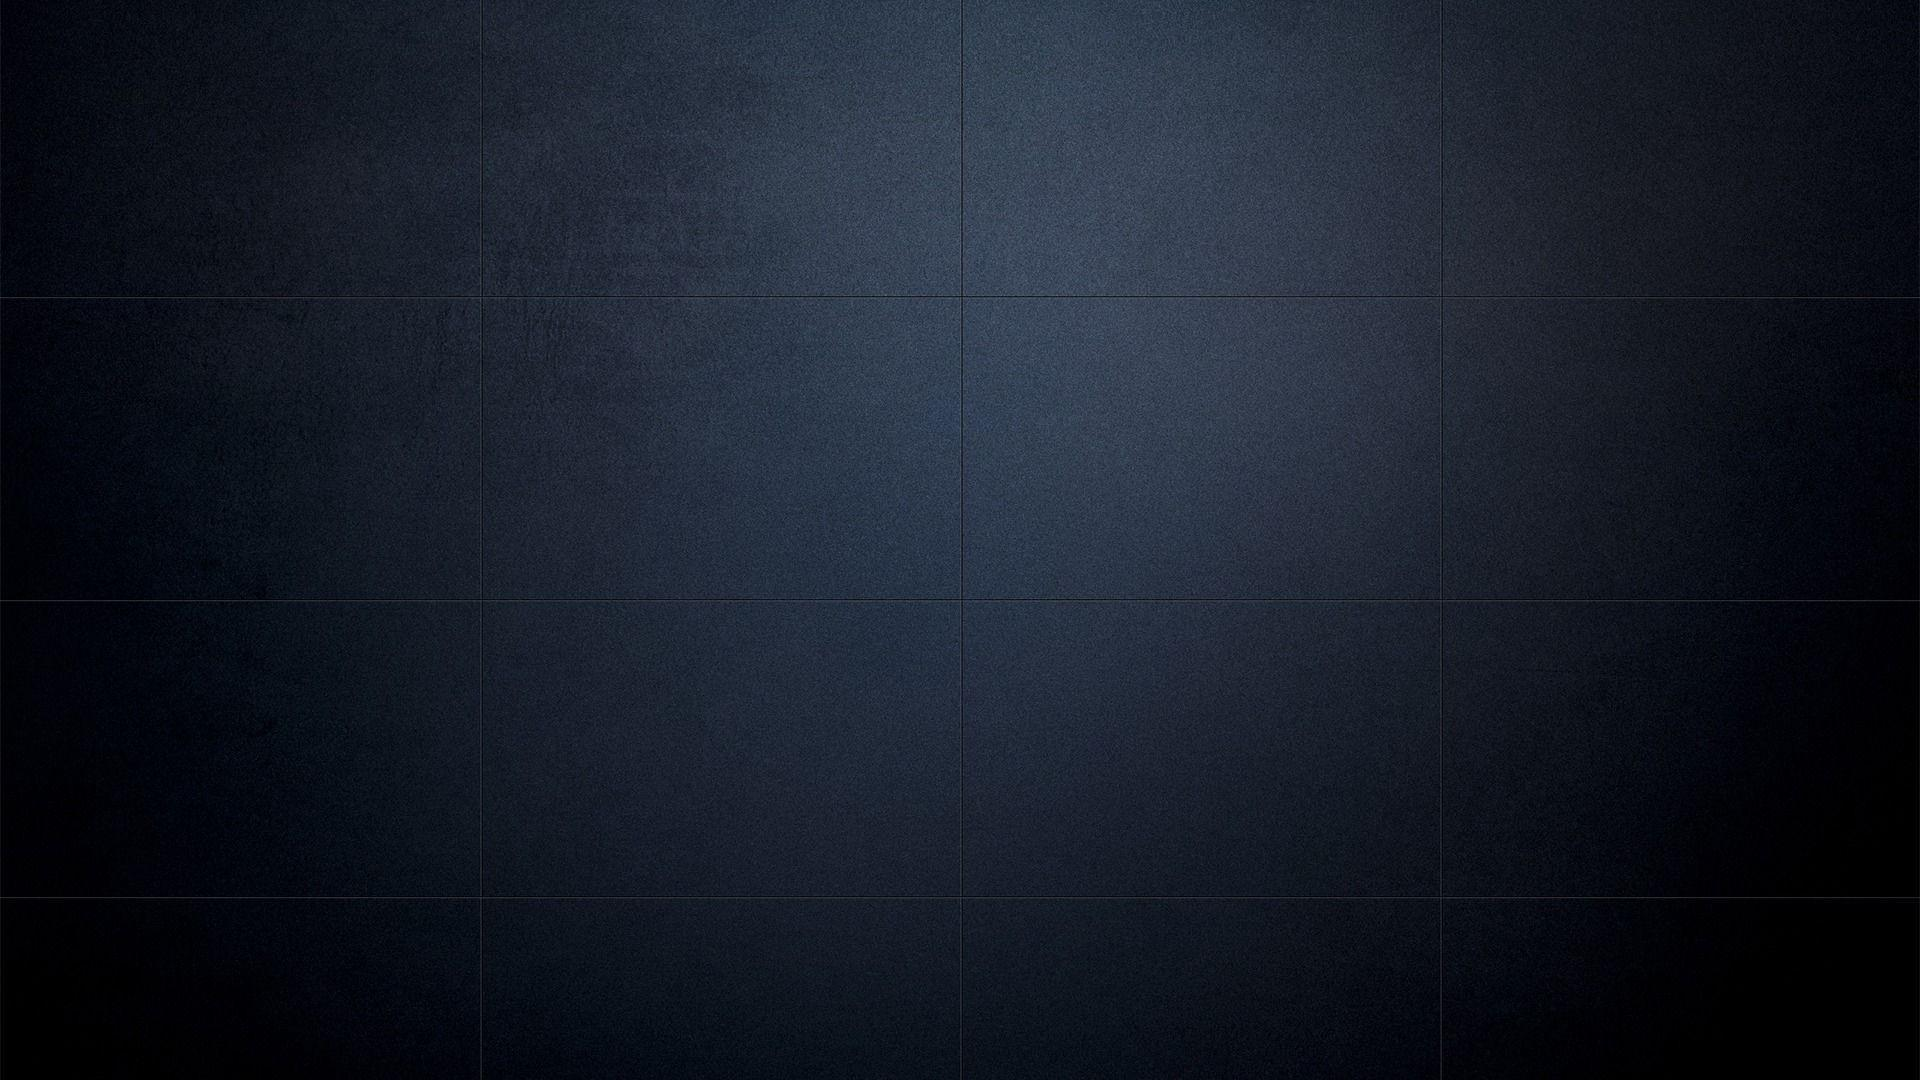 Dark Minimalist Wallpapers - Wallpaper Cave